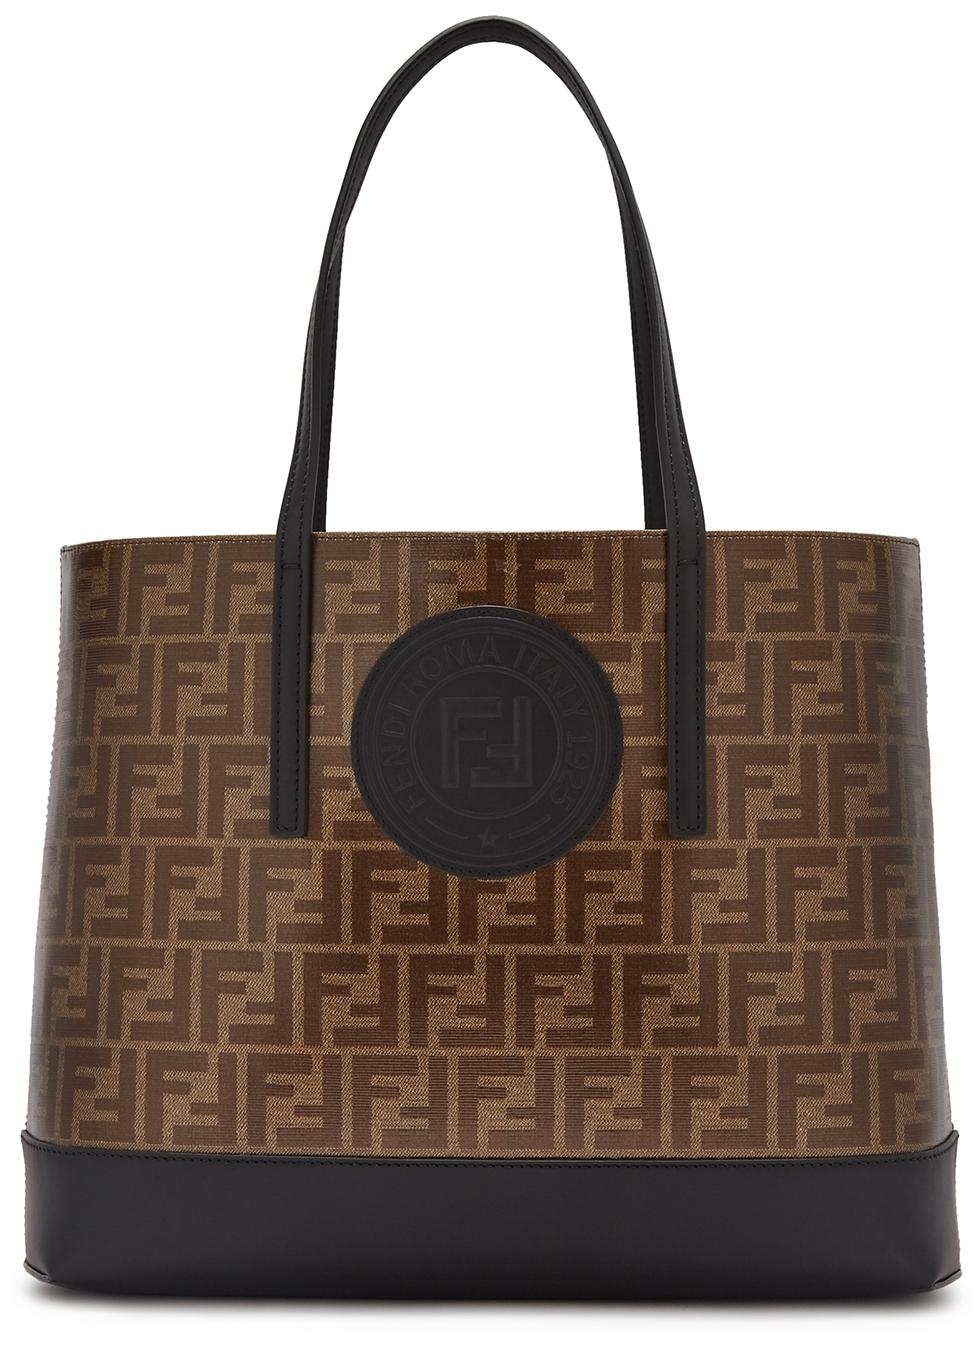 c701afe235 Women s Designer Tote Bags - Leather   Canvas - Harvey Nichols